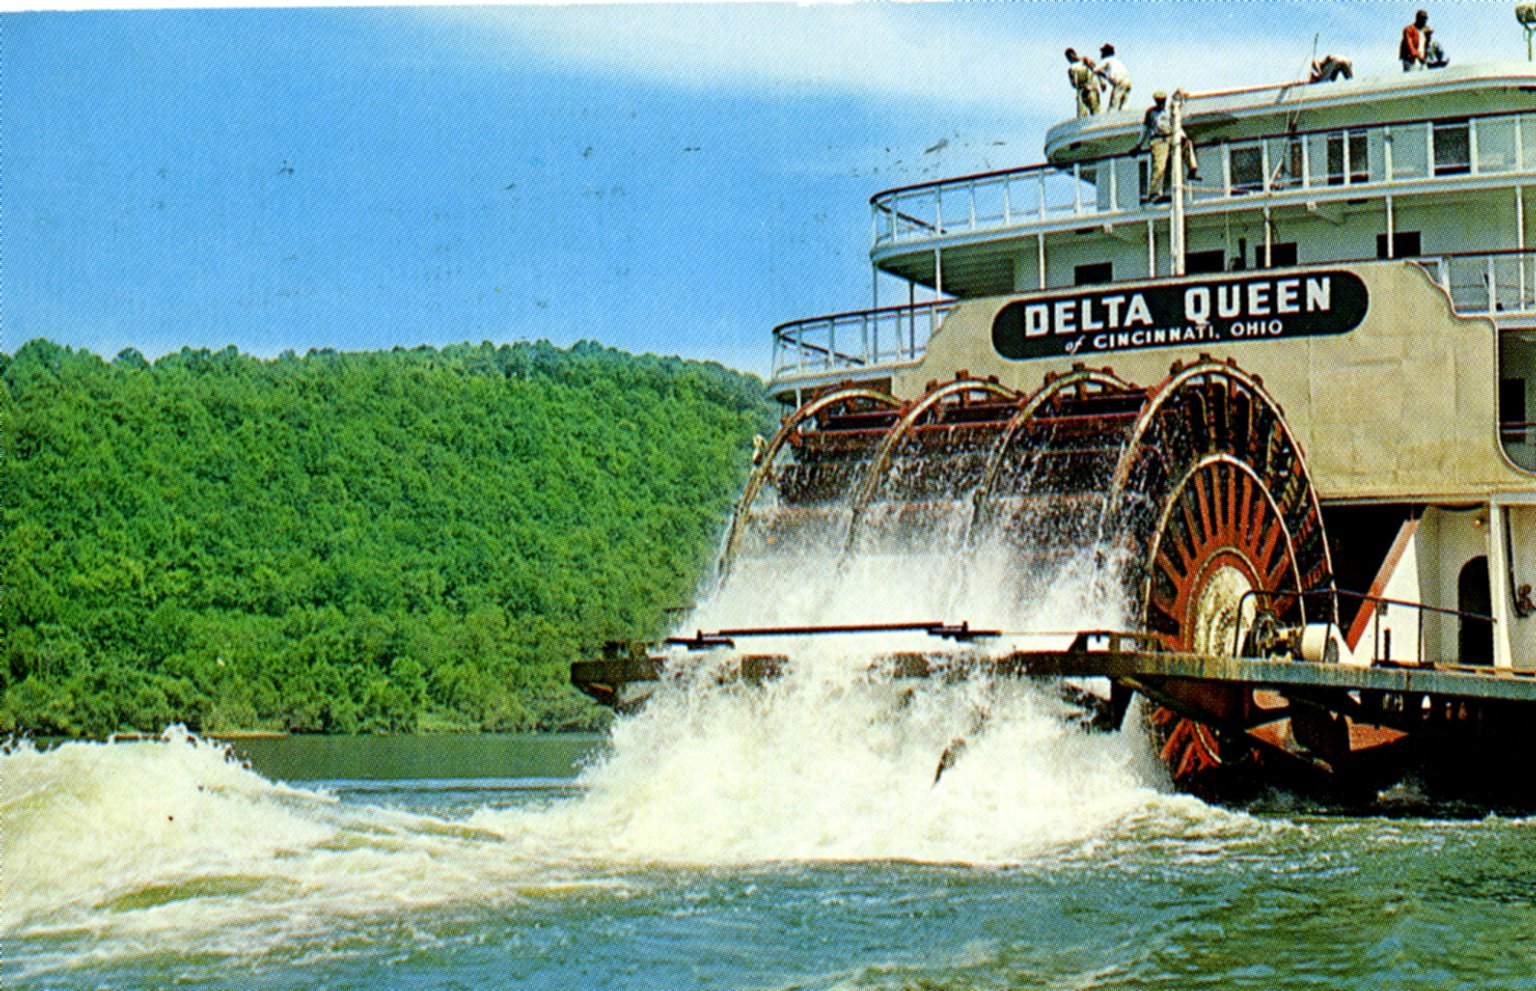 Delta Queen of Cincinnati, Ohio